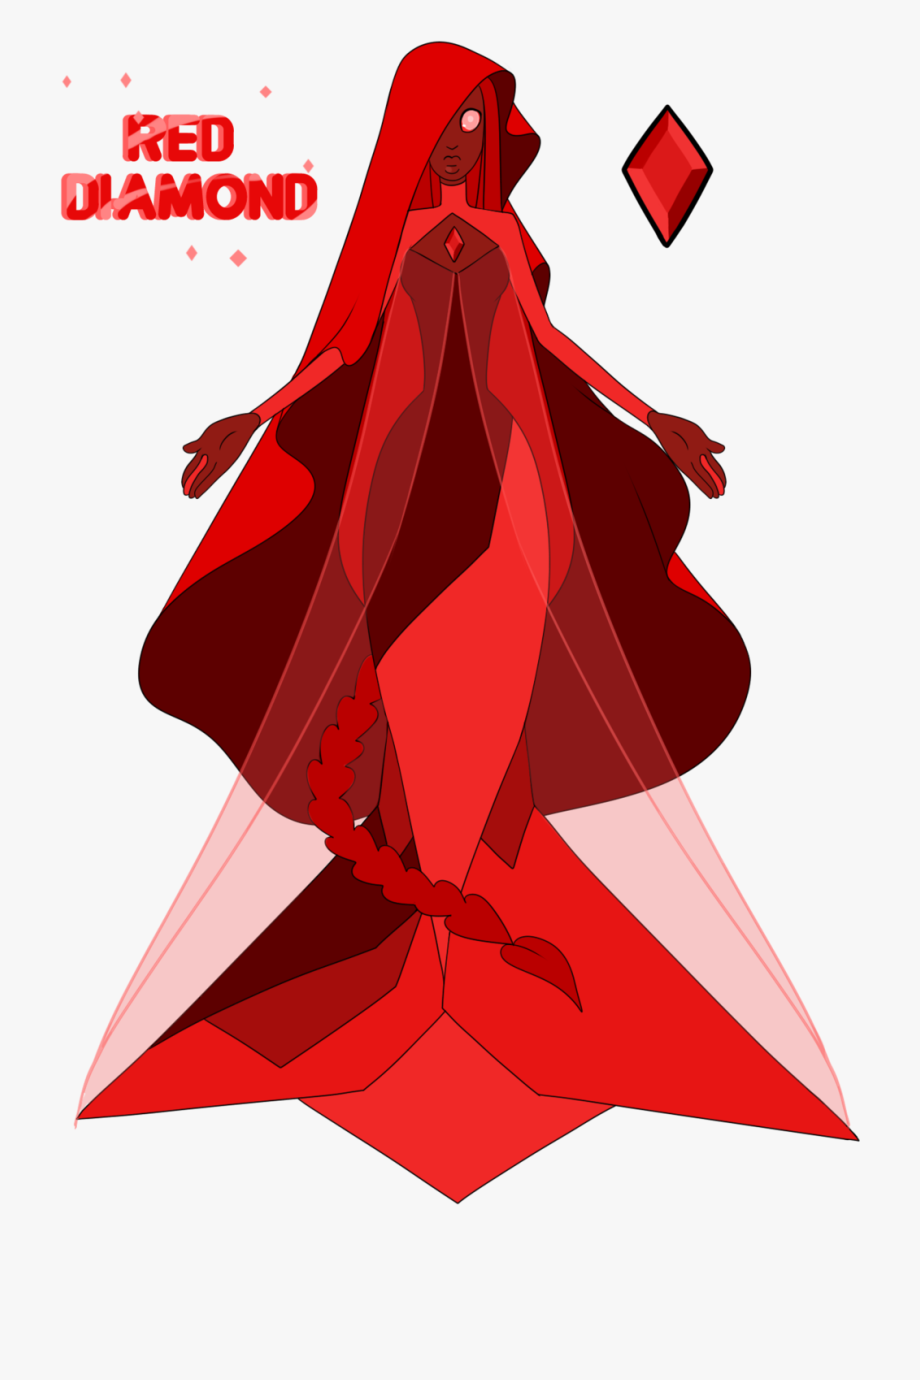 Gem clipart blood diamond. Gems steven universe red